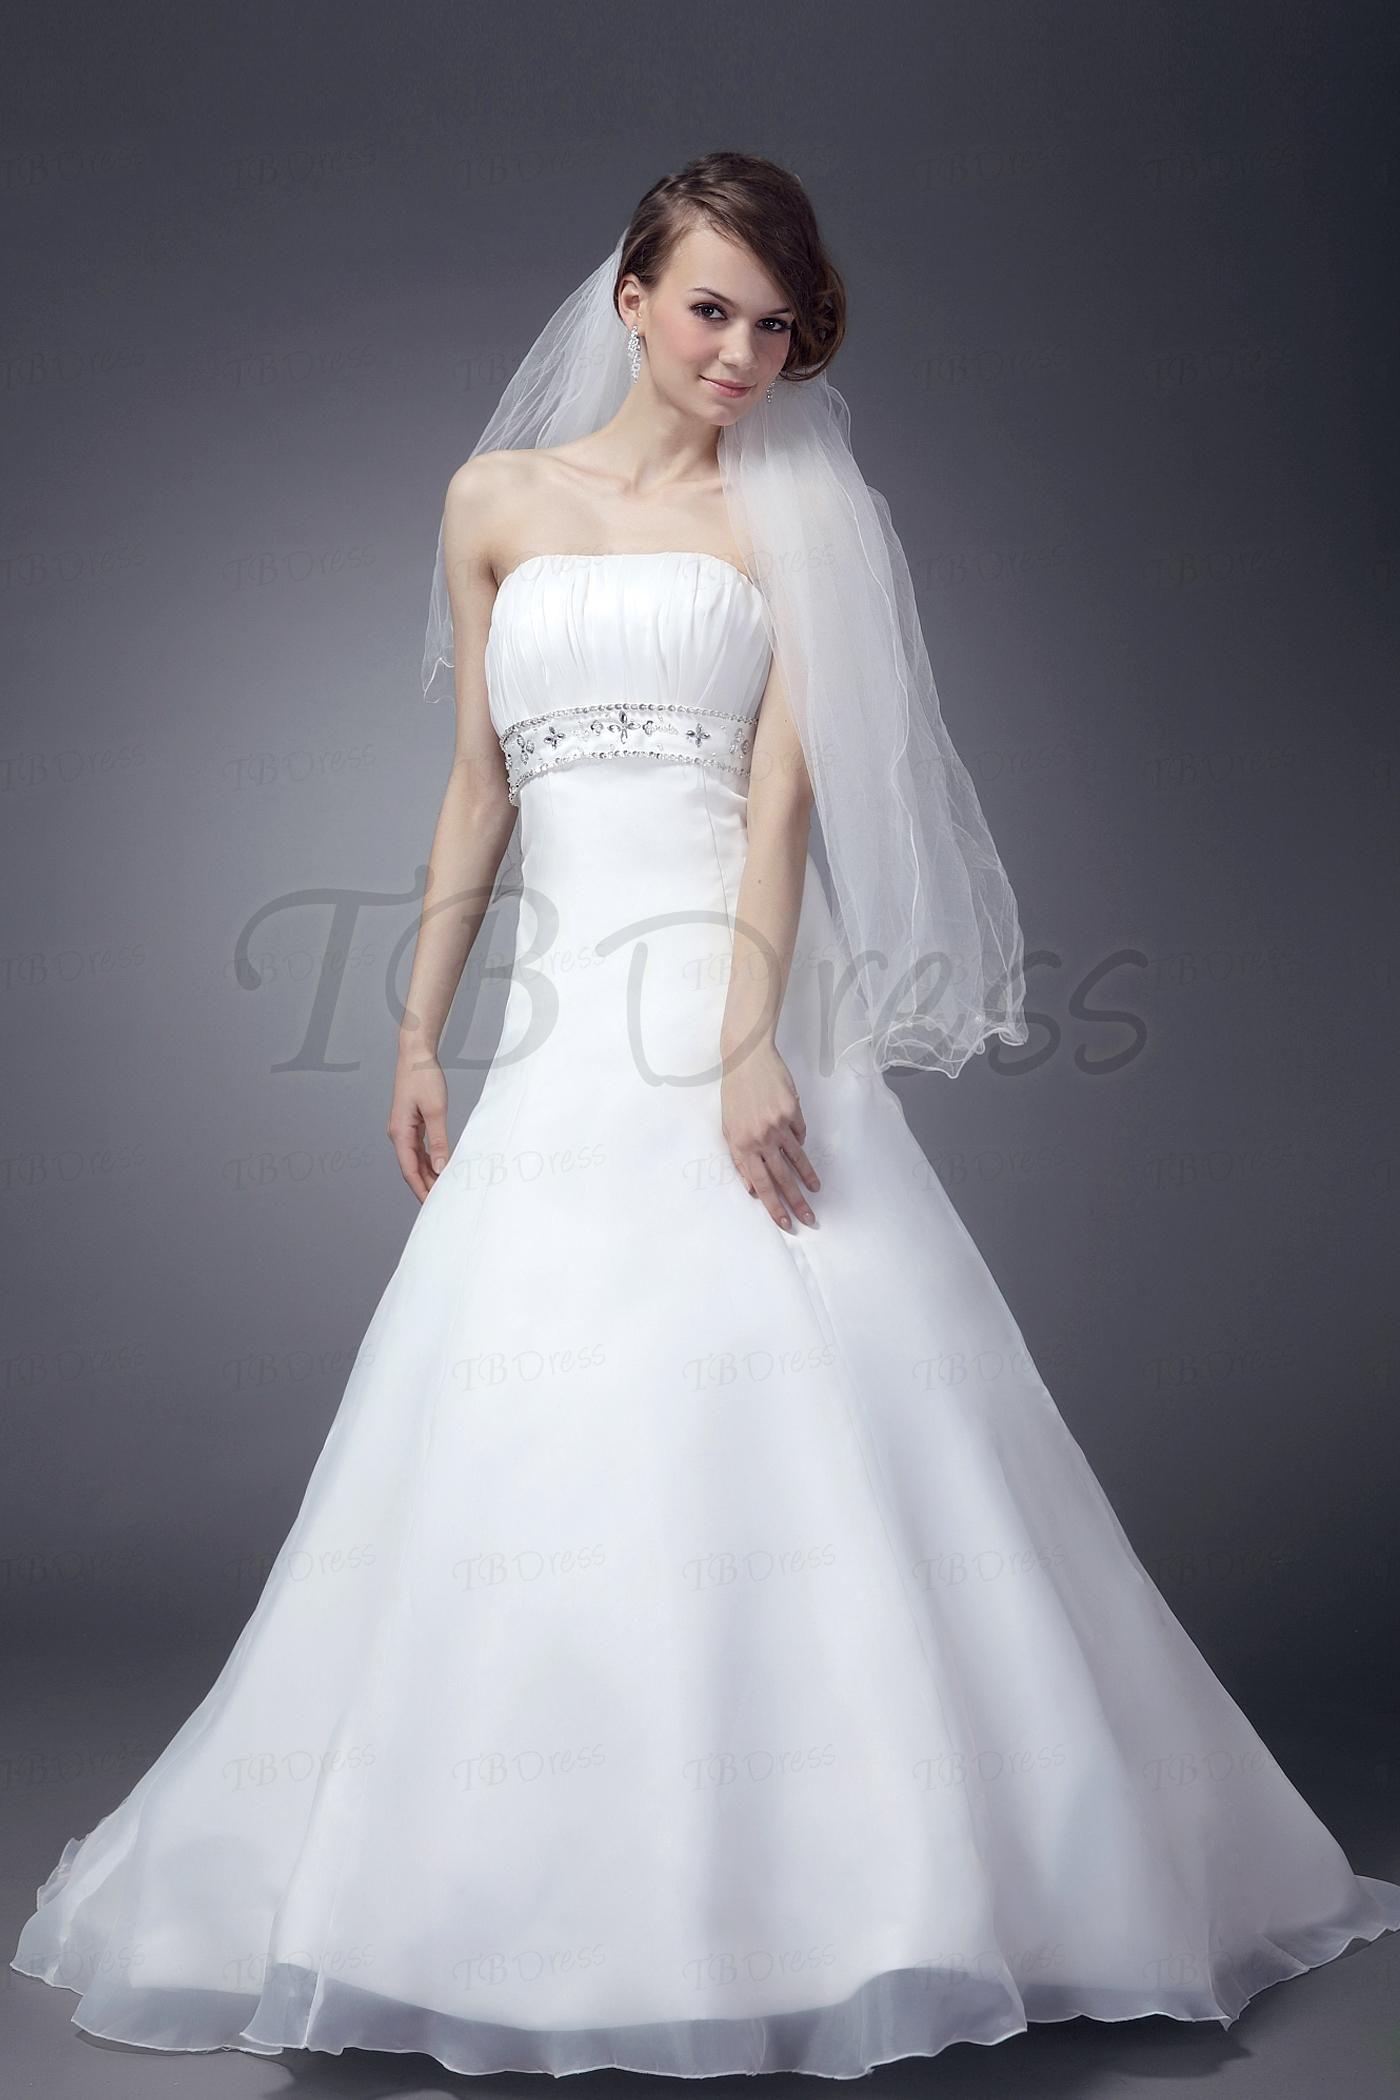 Nice dresses for wedding  Pretty Strapless Aline Beaded Court Nancyus Wedding Dresses SB